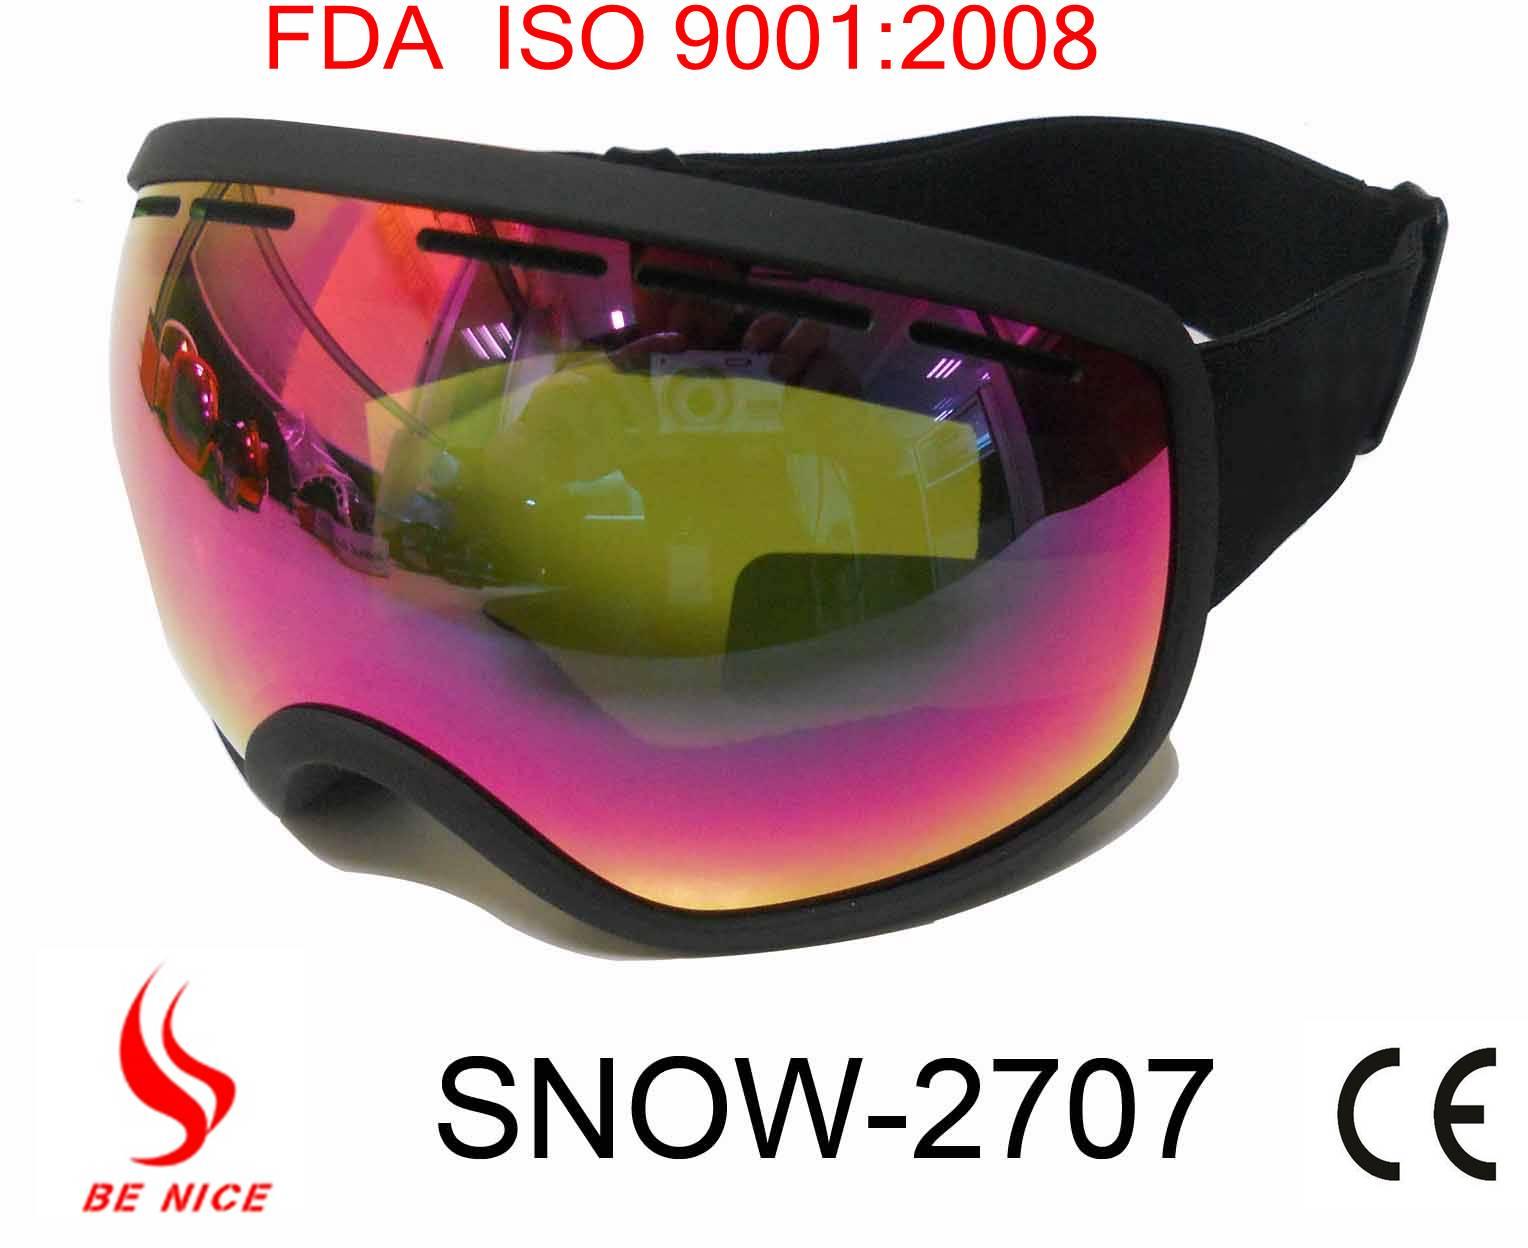 2013 Best seller fashion custom ski goggles, goggles ski with anti-fog uv protection